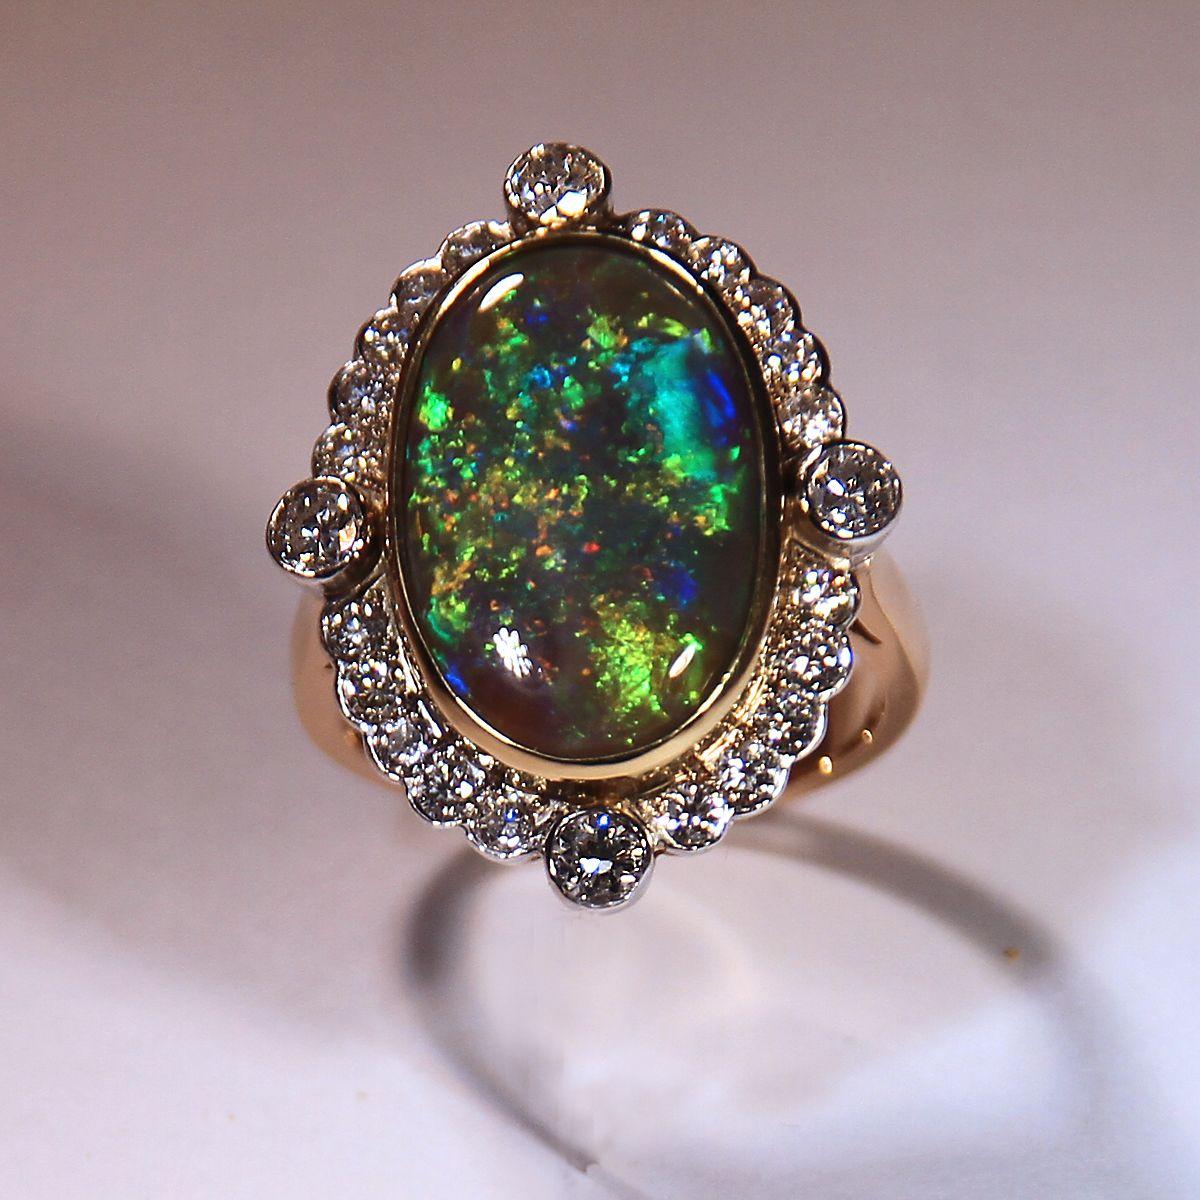 Grandidierite Engagement Ring  Dream Wedding  Pinterest. Affordable Diamond Wedding Rings. Micro Pave Bands. Volcano Bracelet. Triple Earrings. Designer Anklet. Message Bracelet. Party Bracelet. Emrald Rings